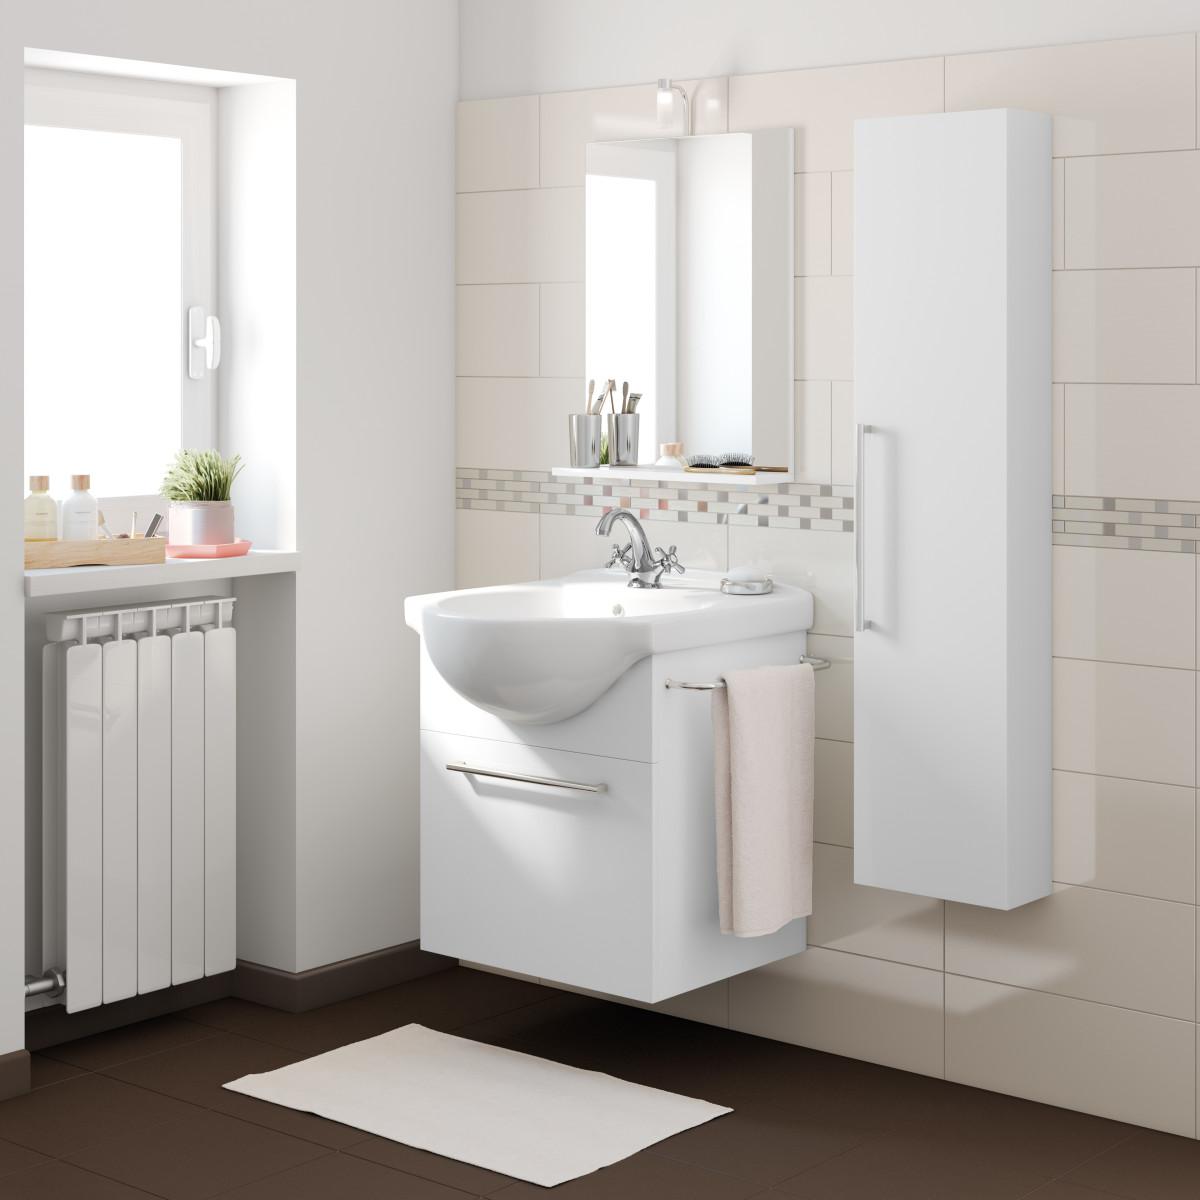 Bagno grigio perla - Leroy mobili bagno ...